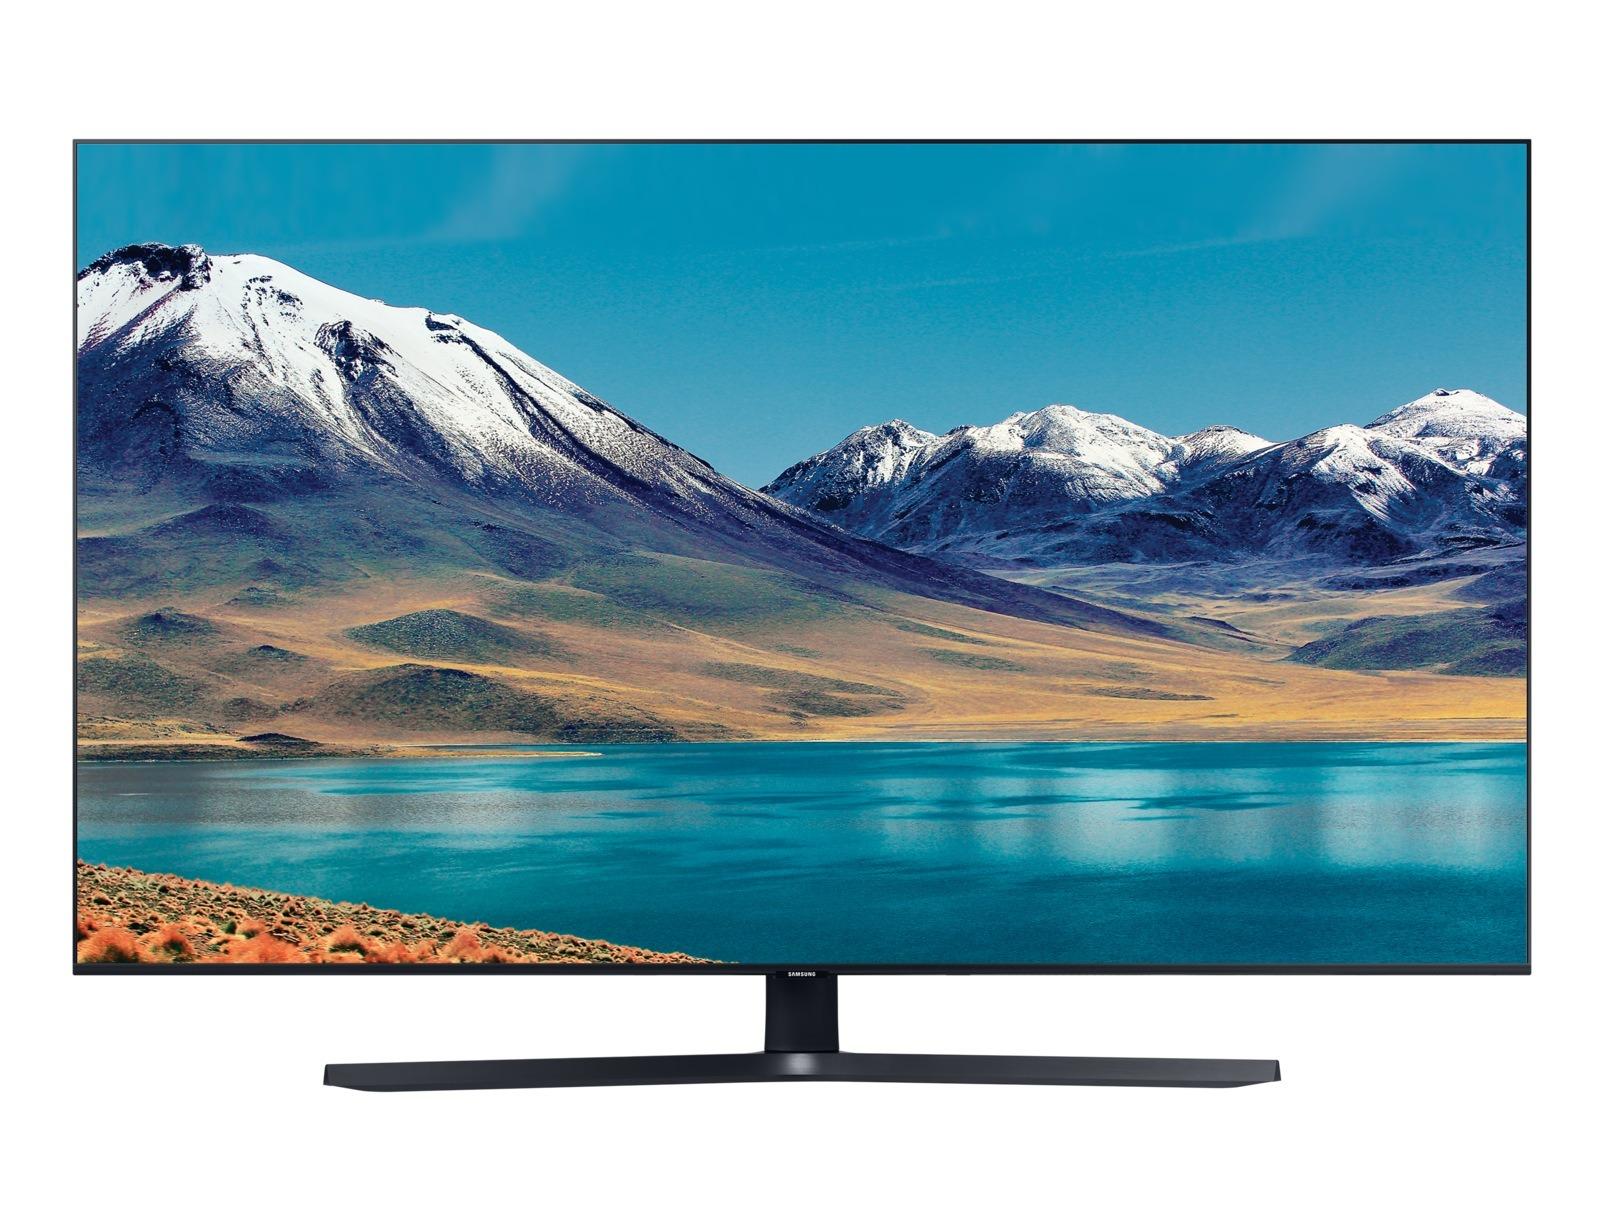 Samsung UE55TU8500S 55 inch UHD TV